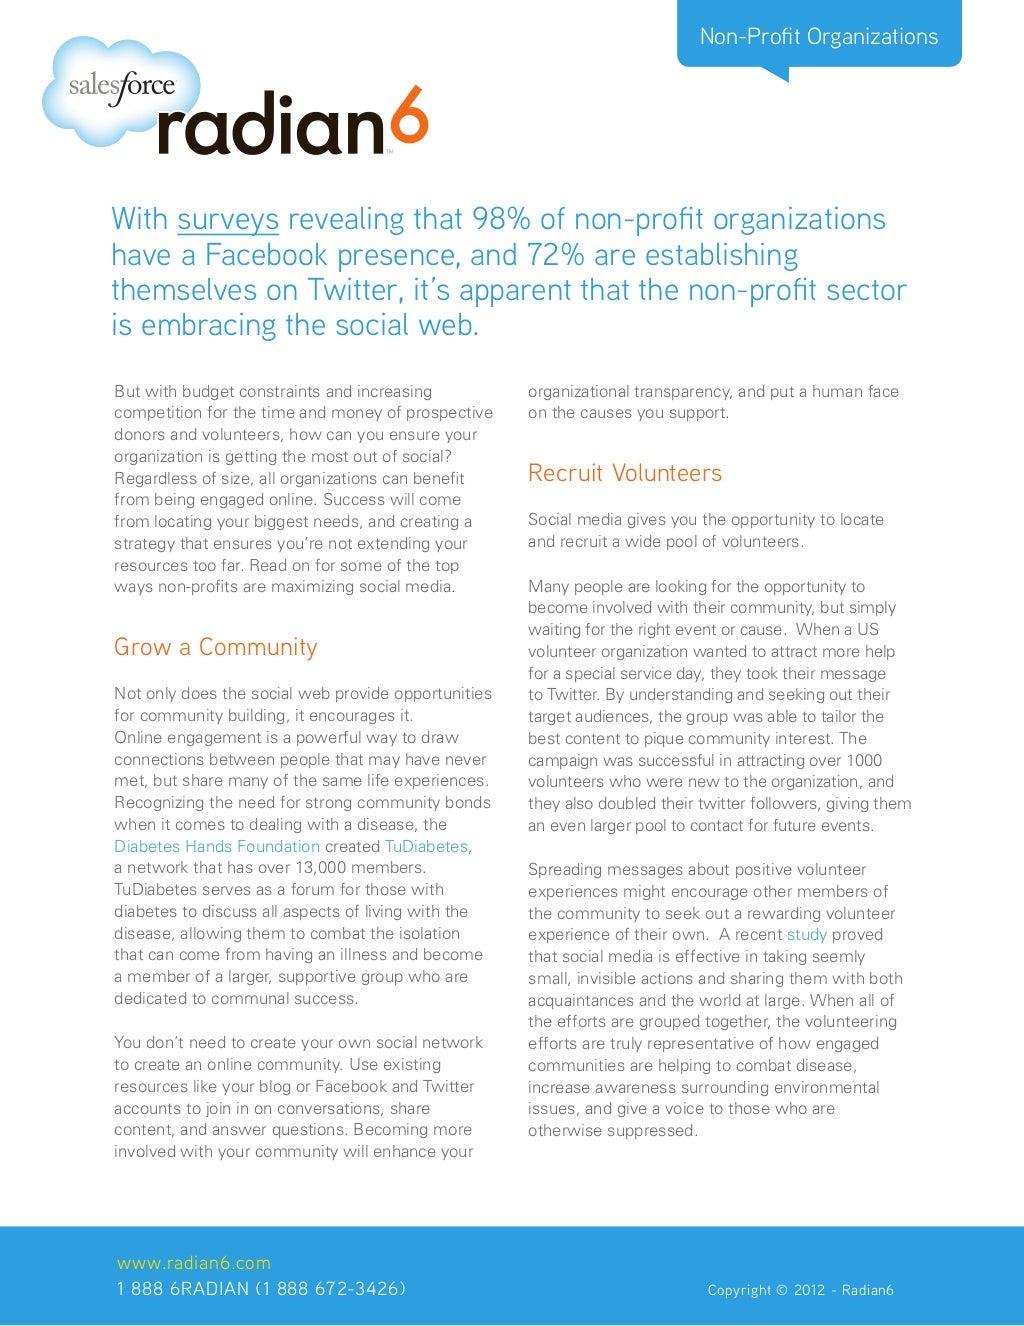 Non-Profit Organizations Embrace the Social Web